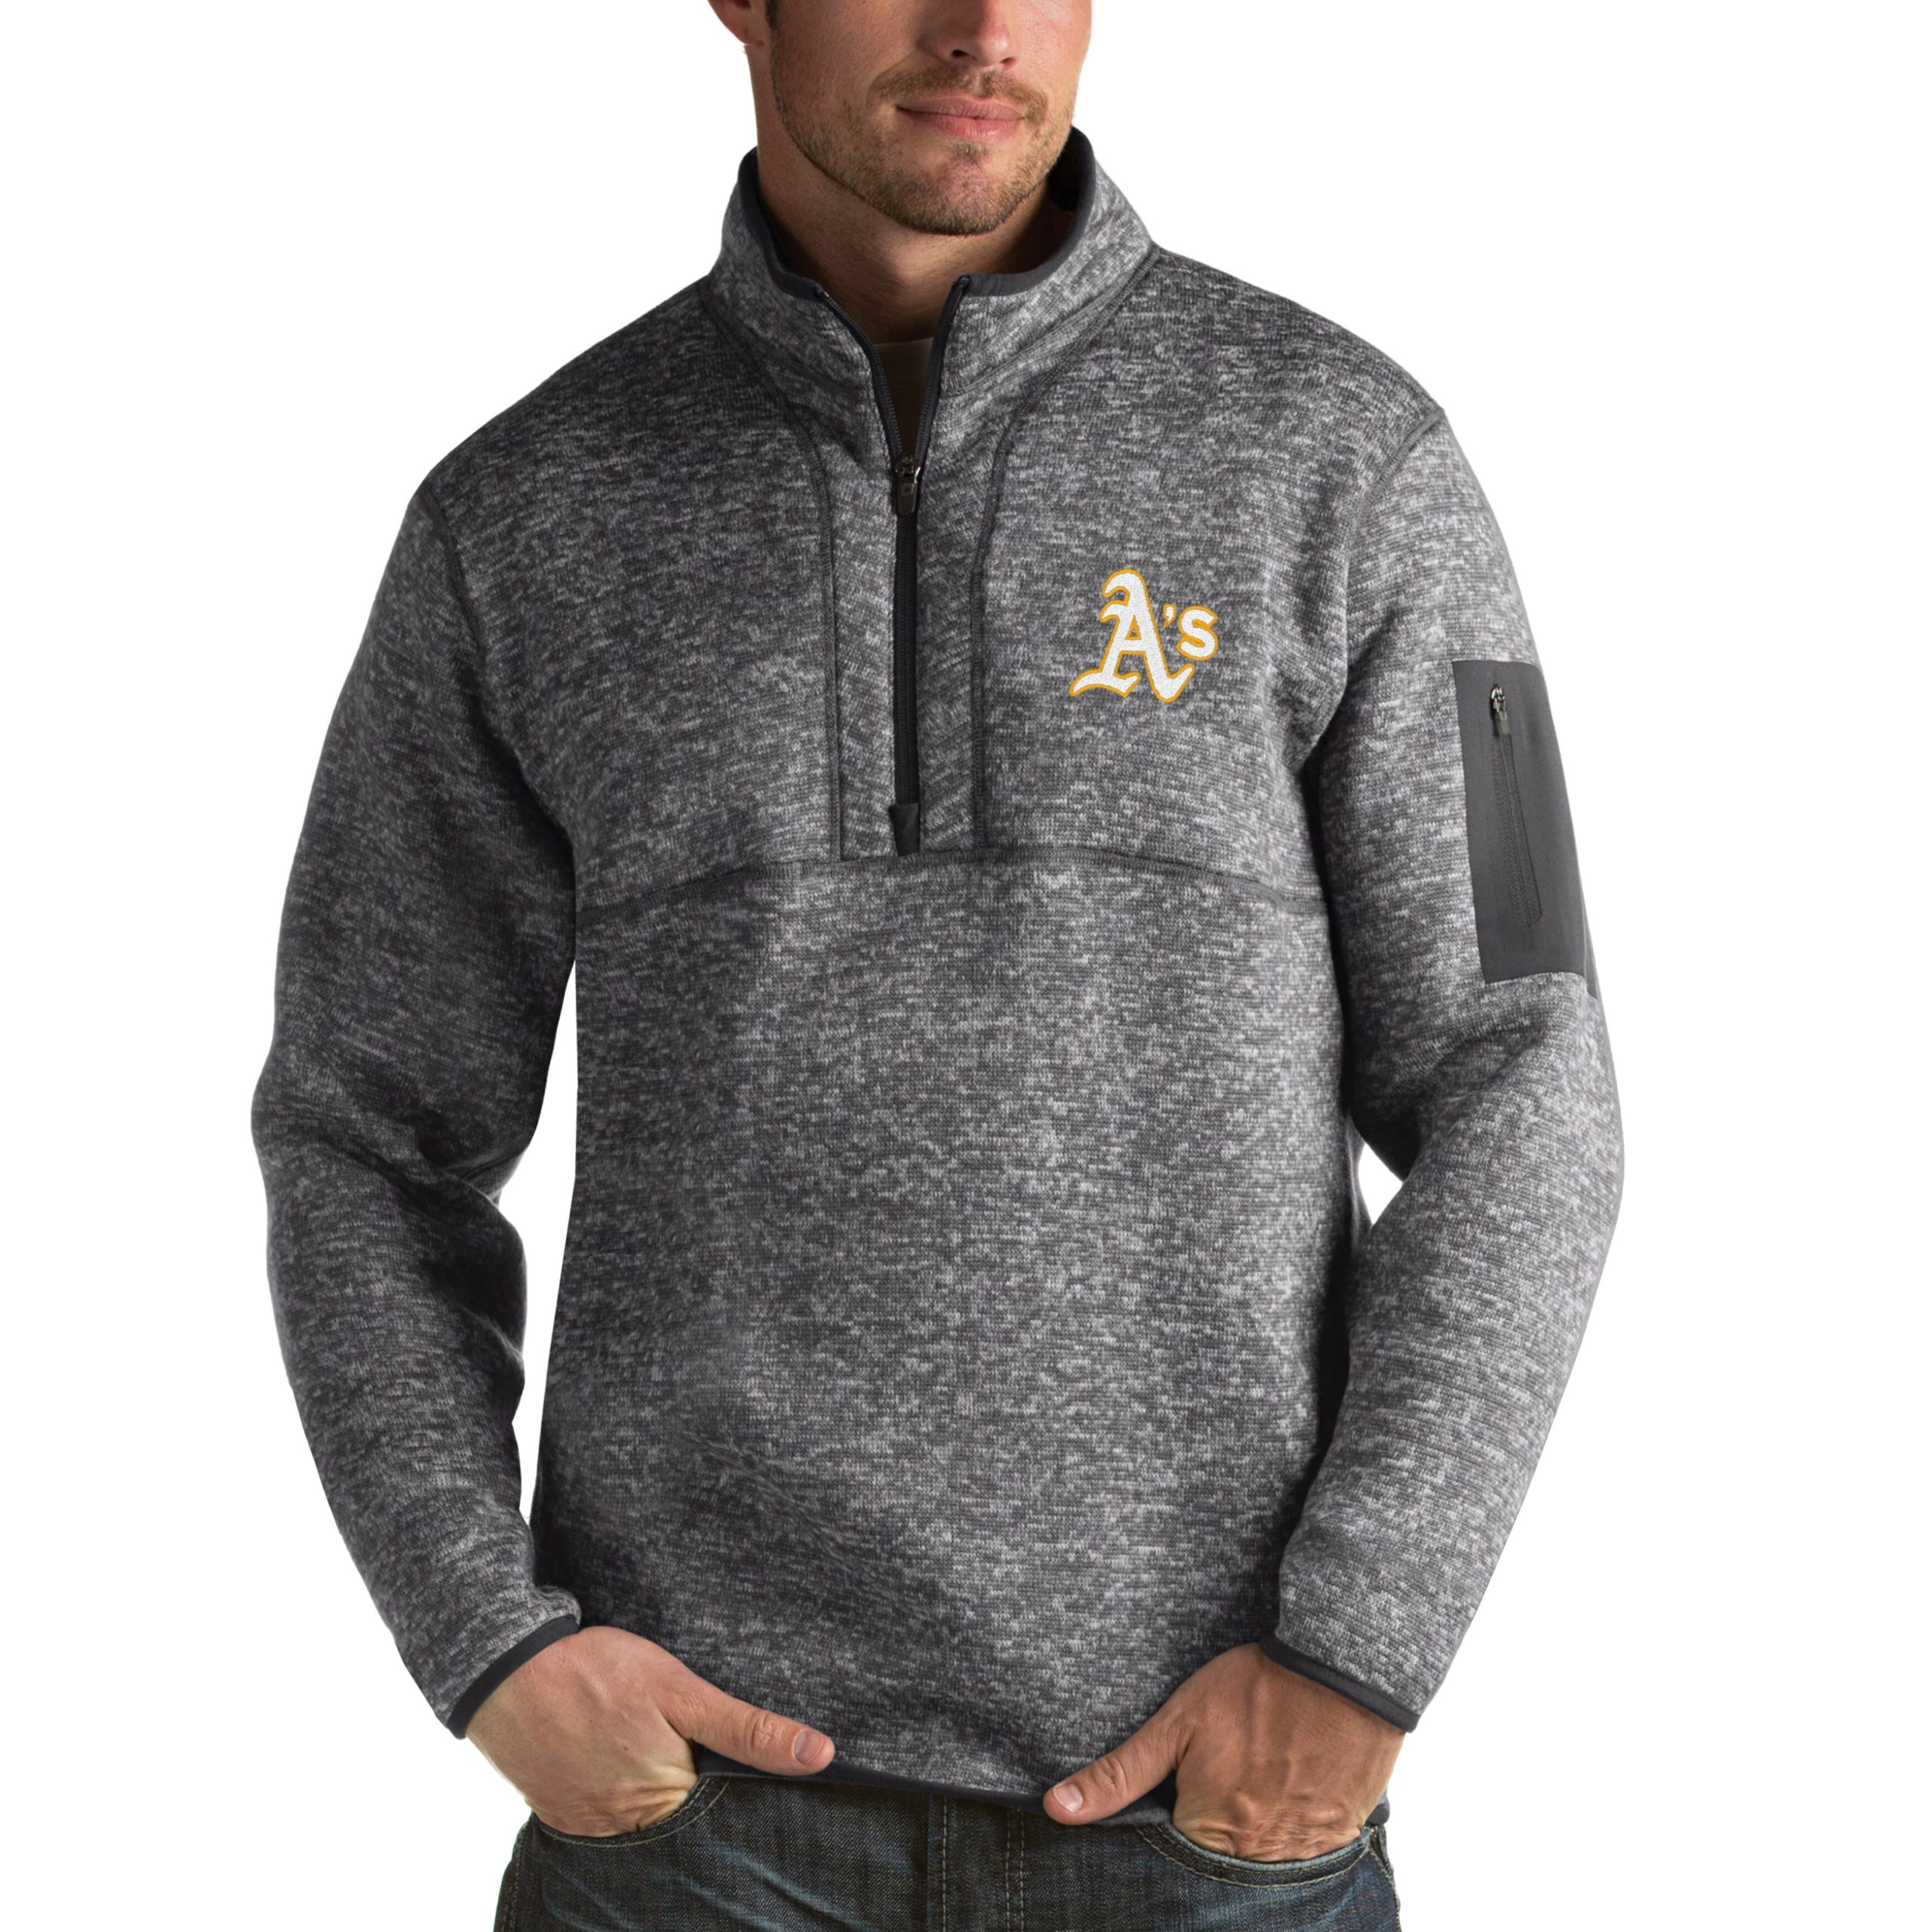 Oakland Athletics Antigua Fortune Half-Zip Sweater - Heathered Charcoal